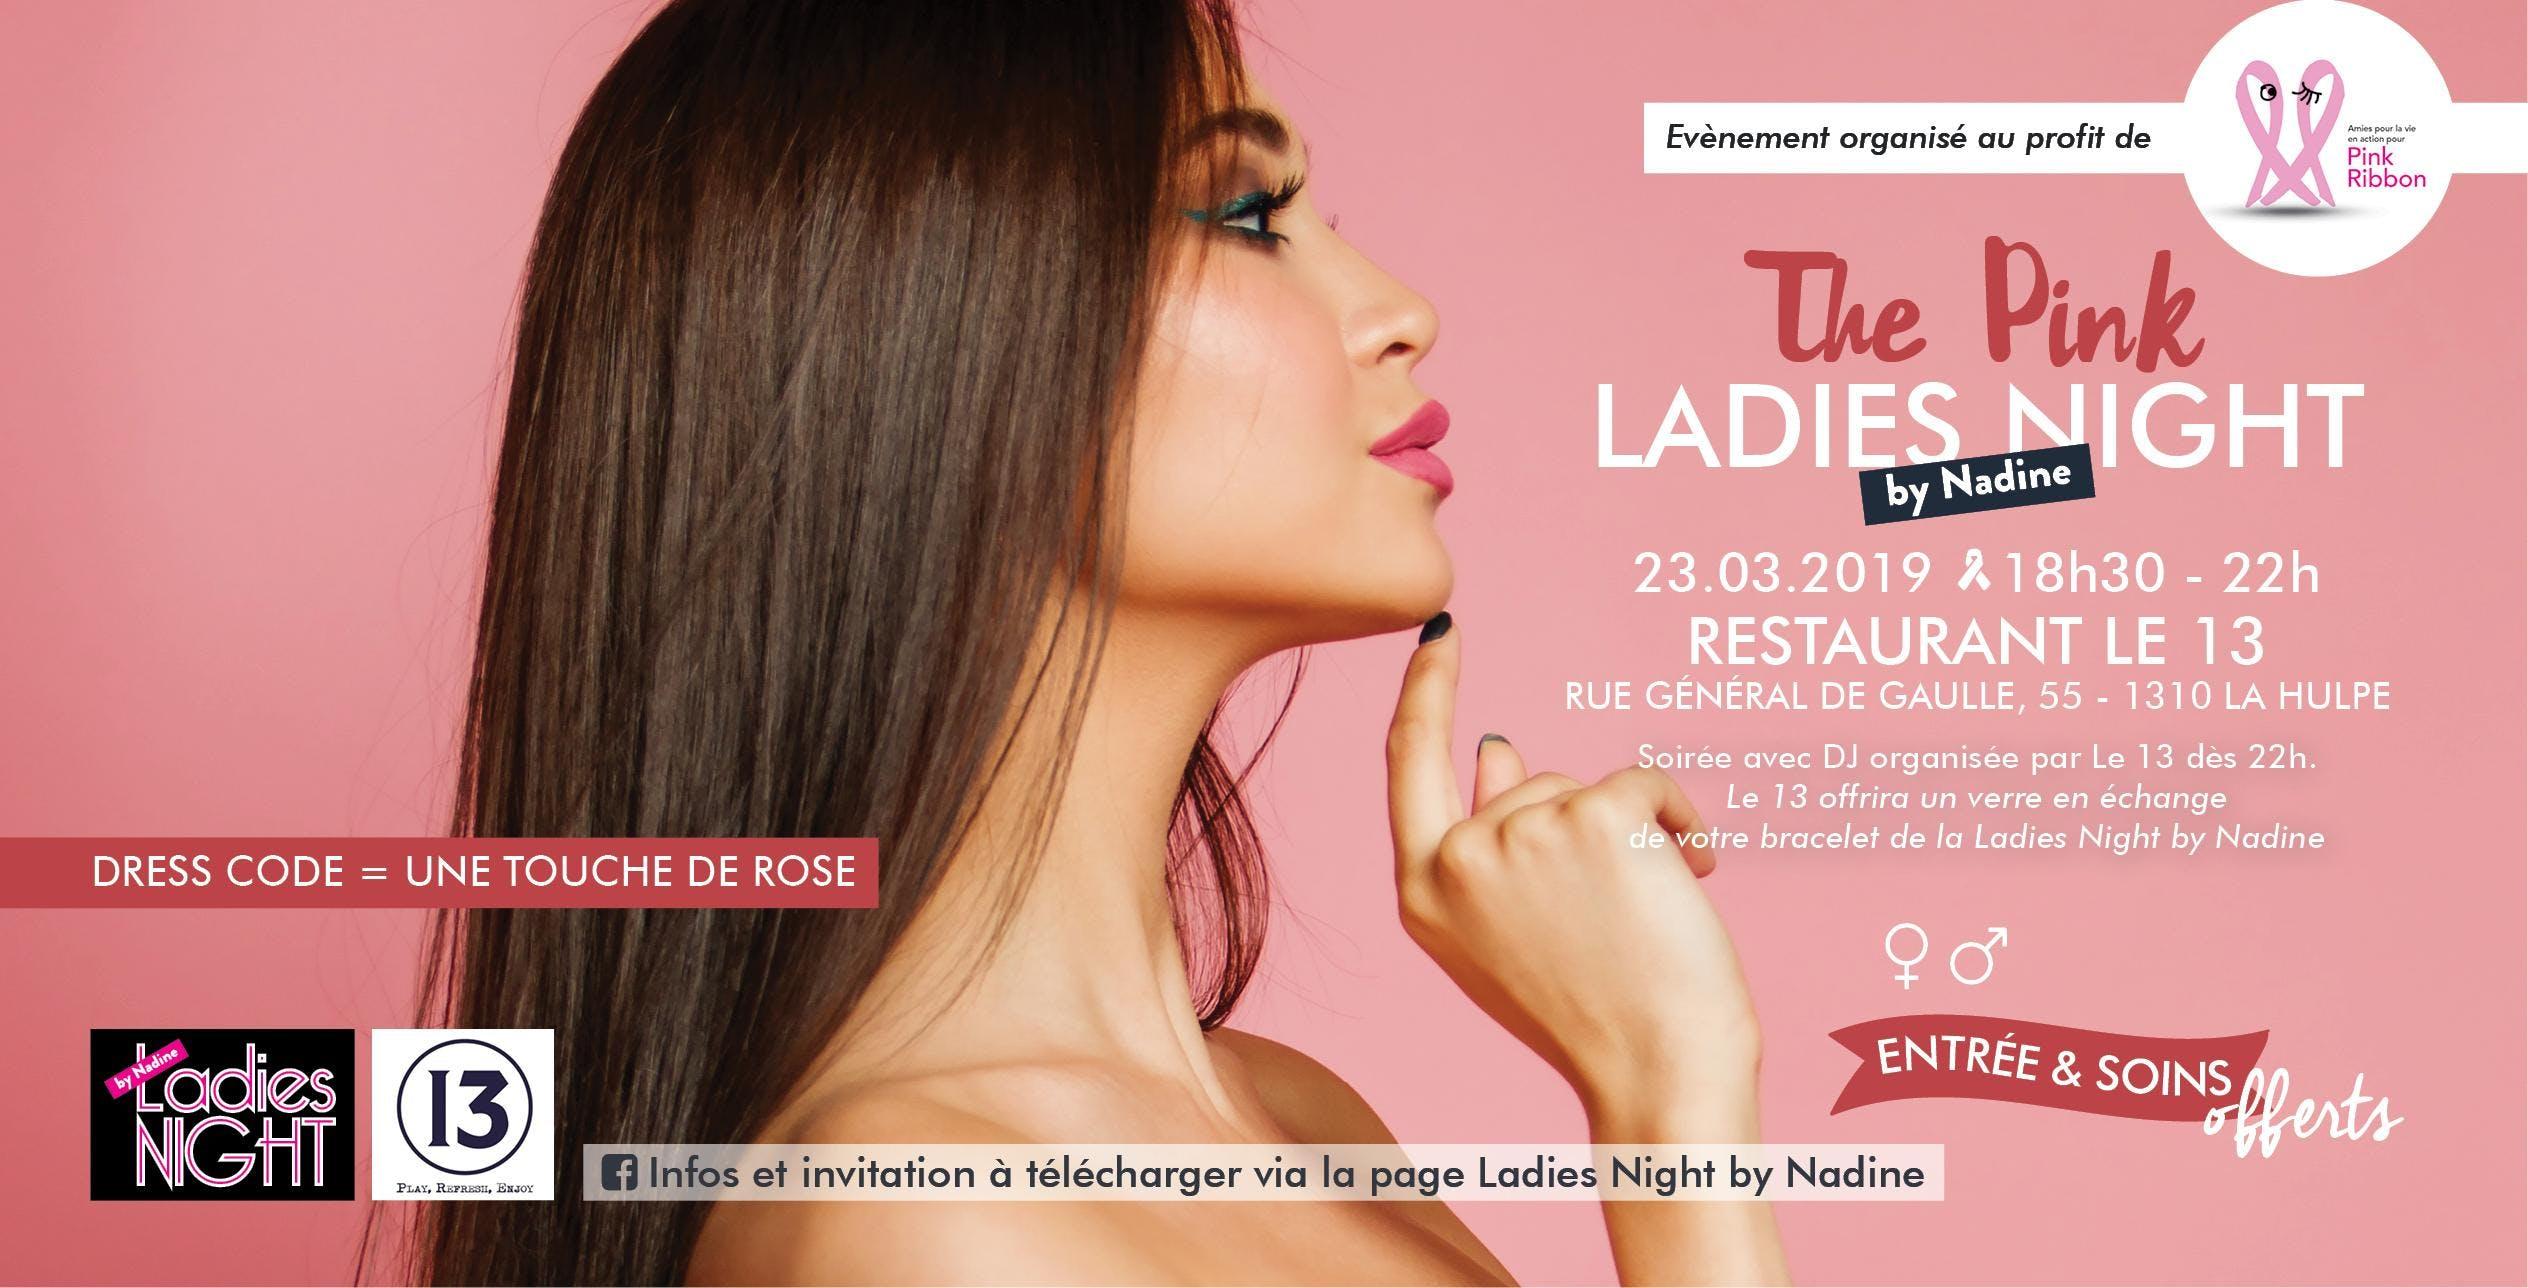 Invitation - The Pink Ladies Night by Nadine